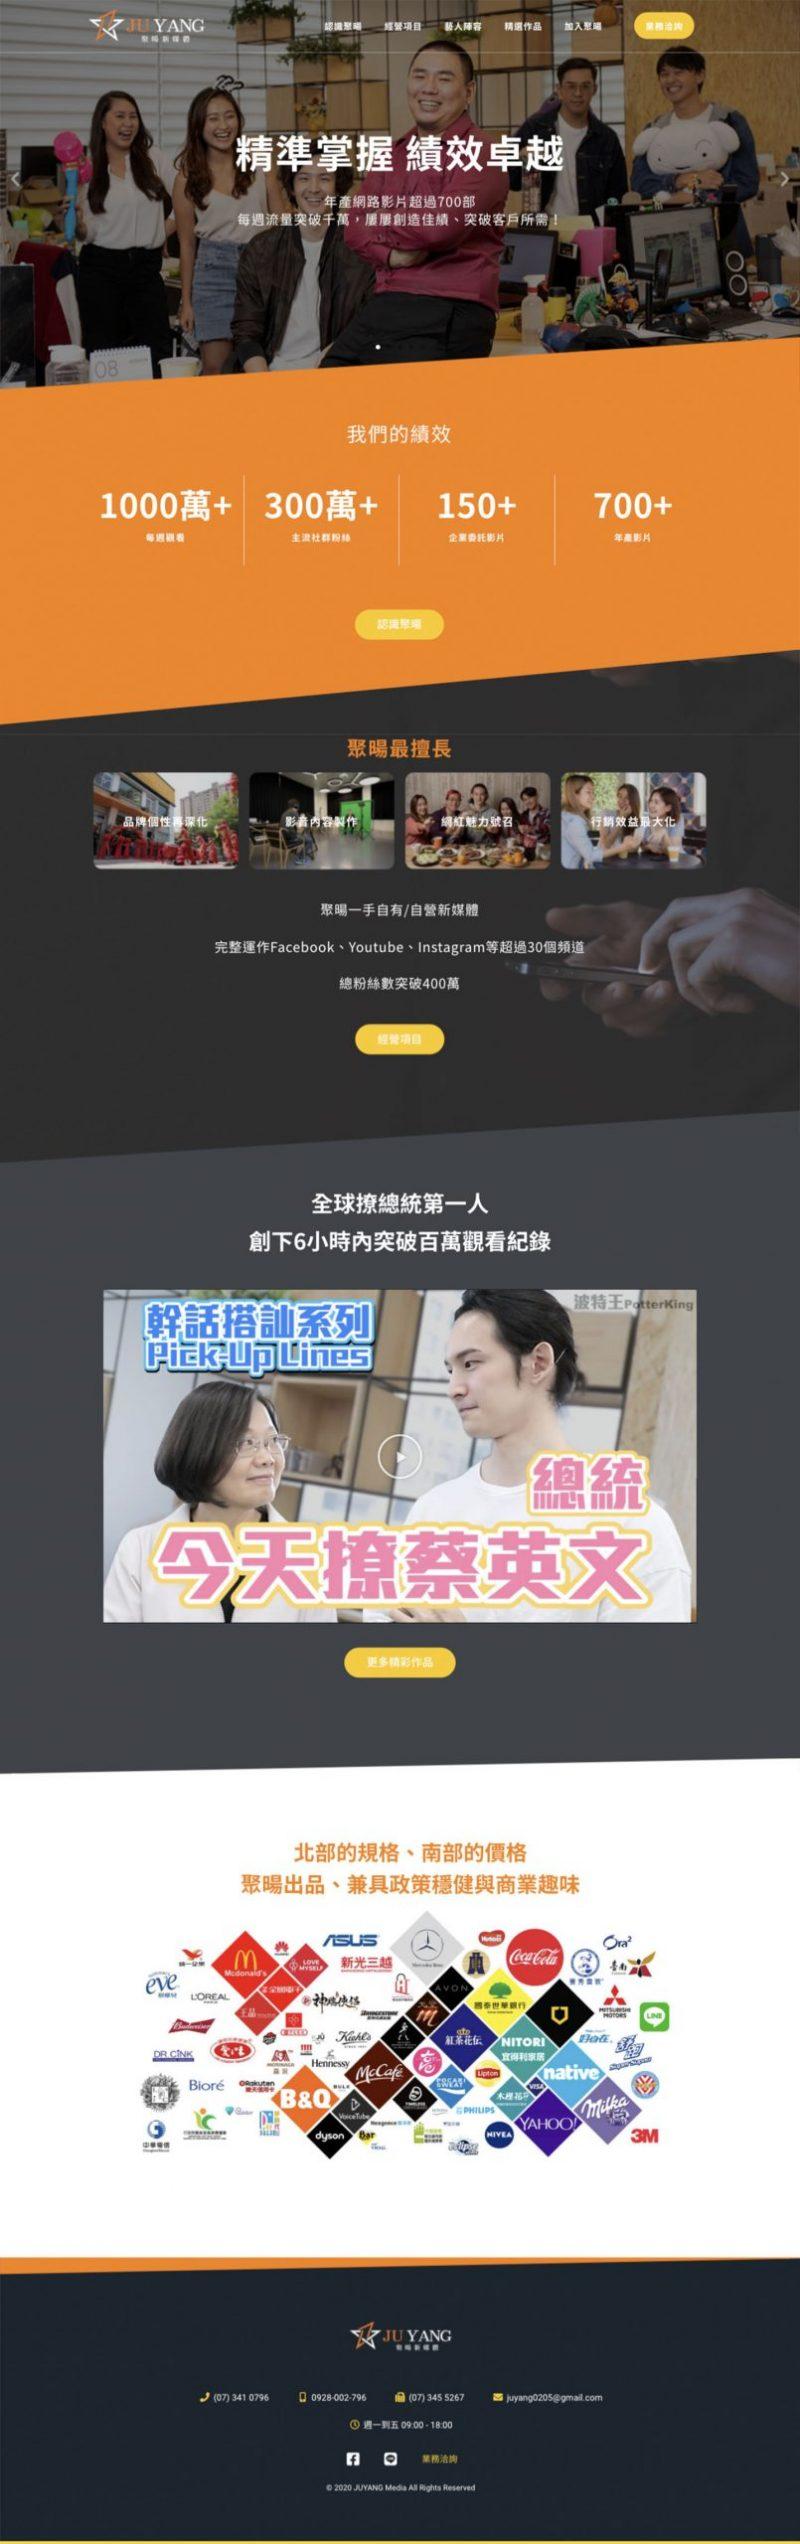 juyang_media_showcase